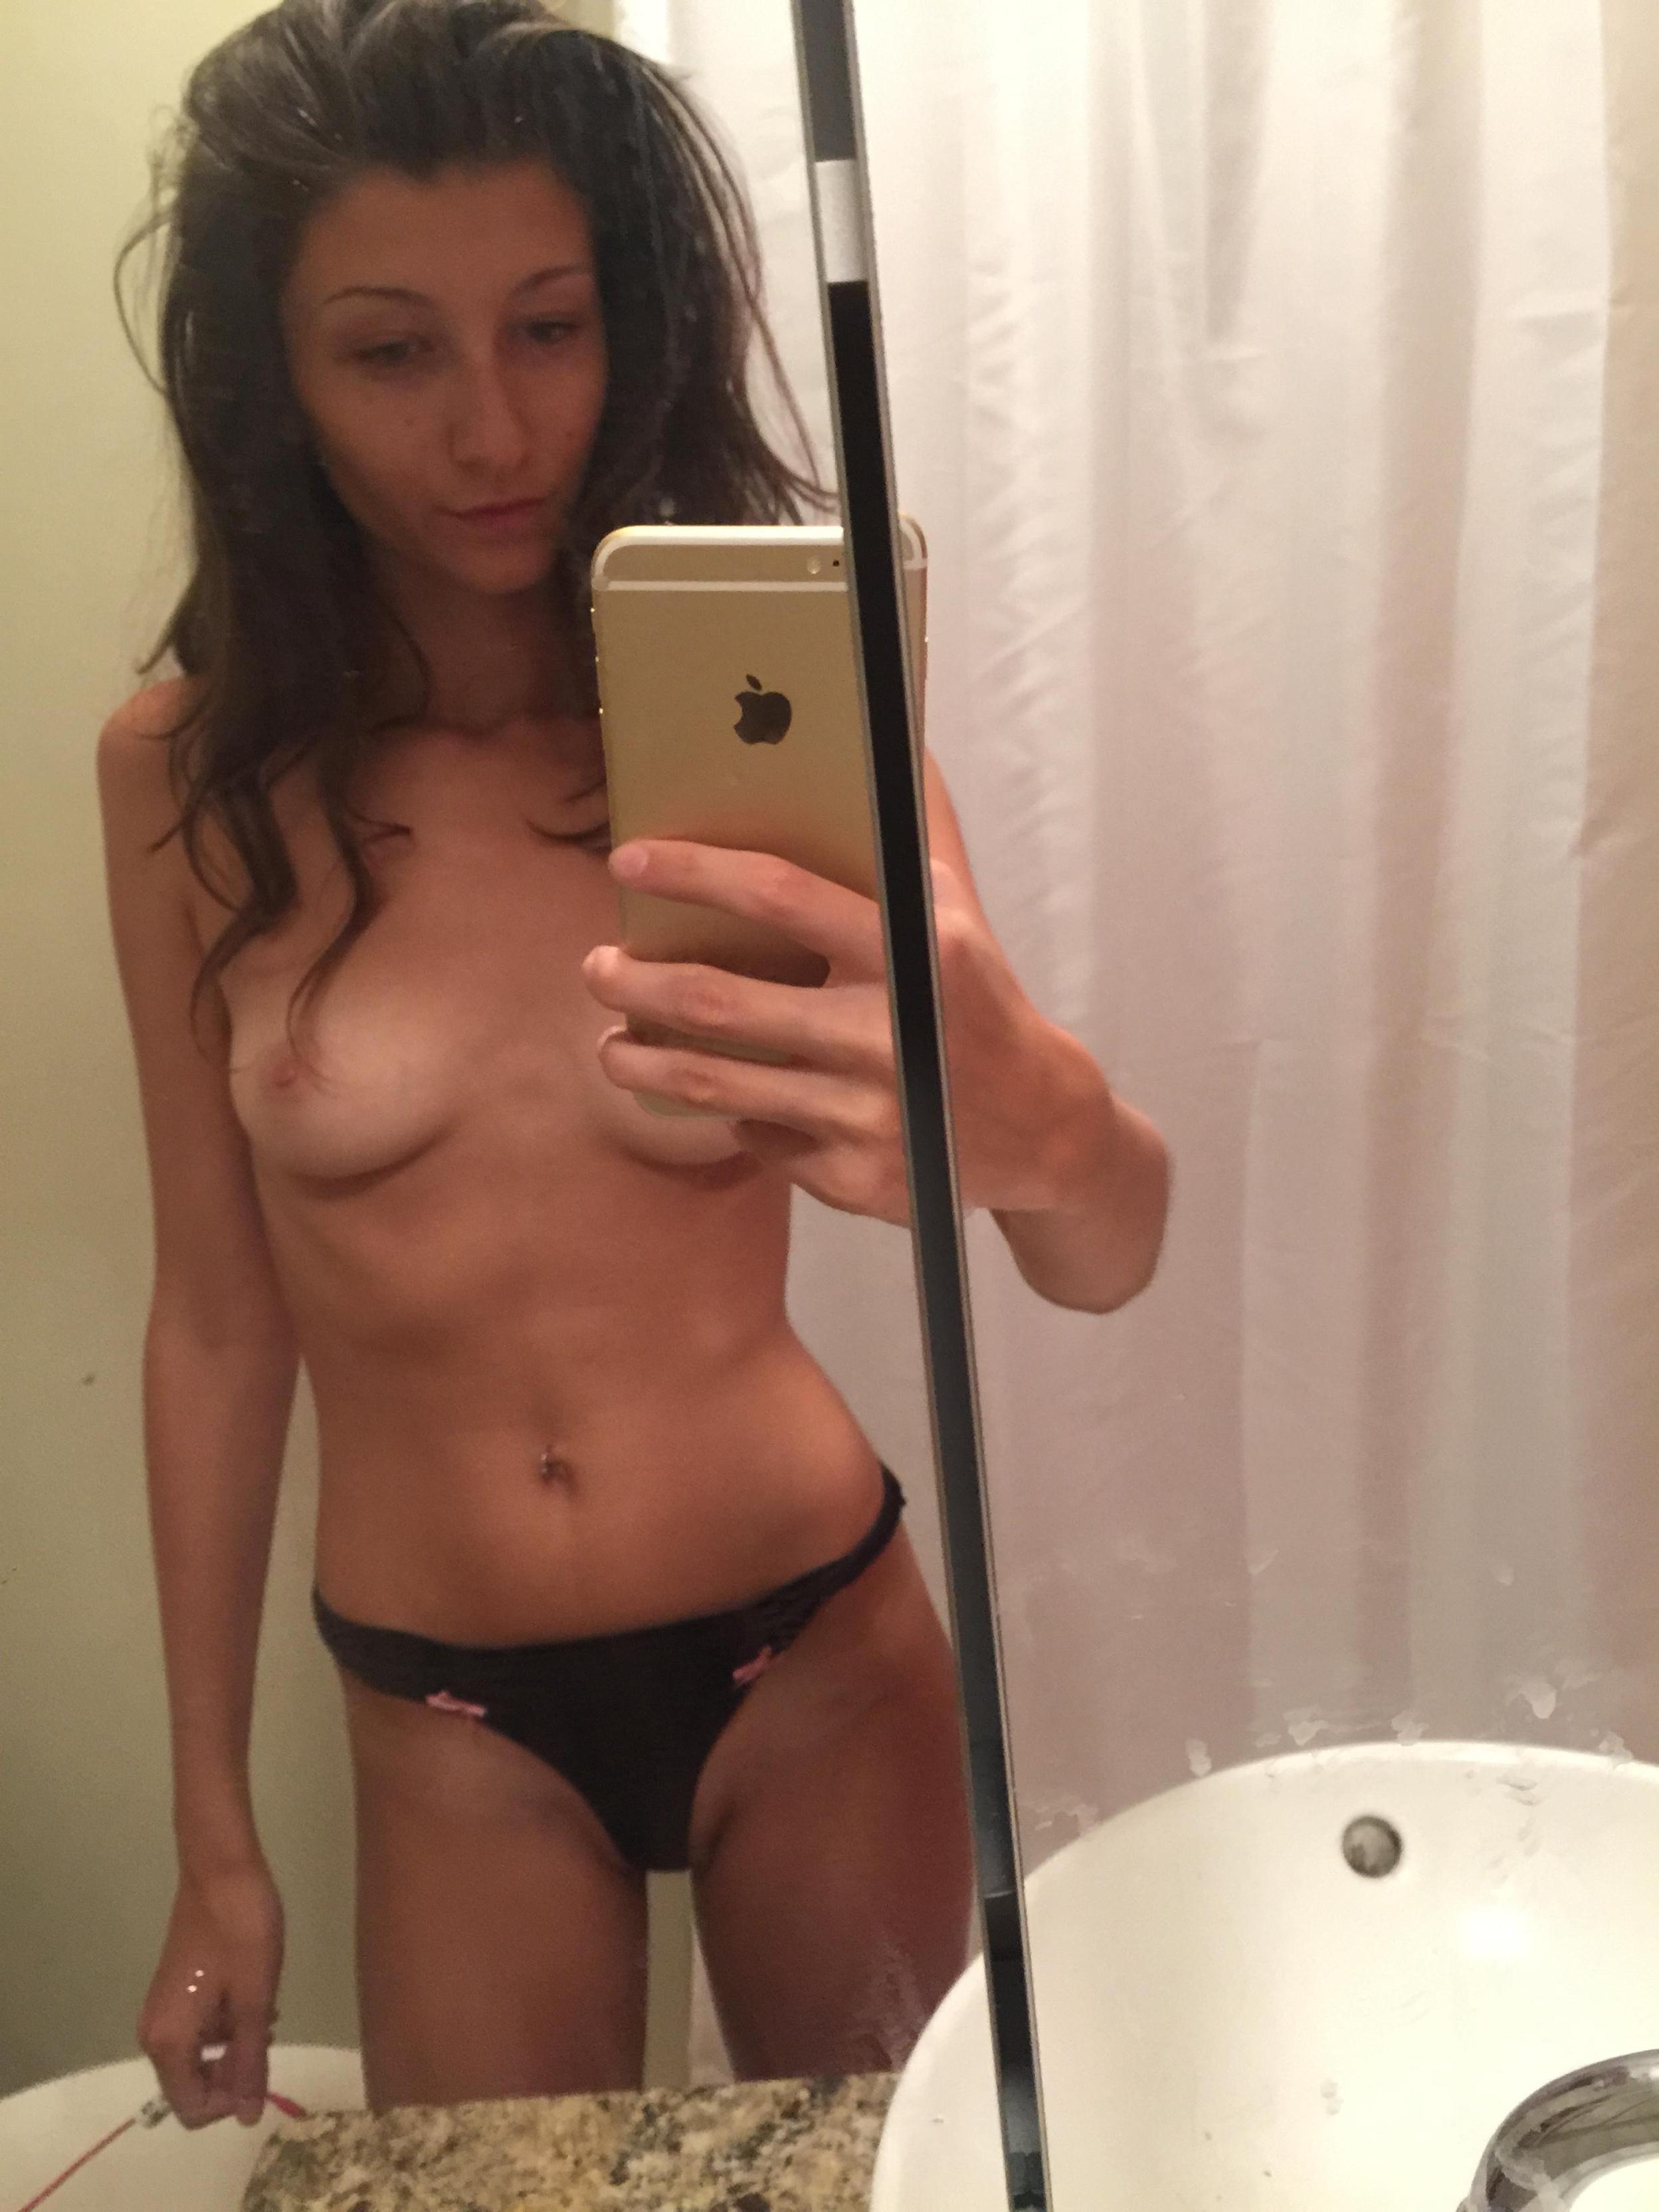 slim-body-amateur-girl-selfie-pics-mirror-nude-13